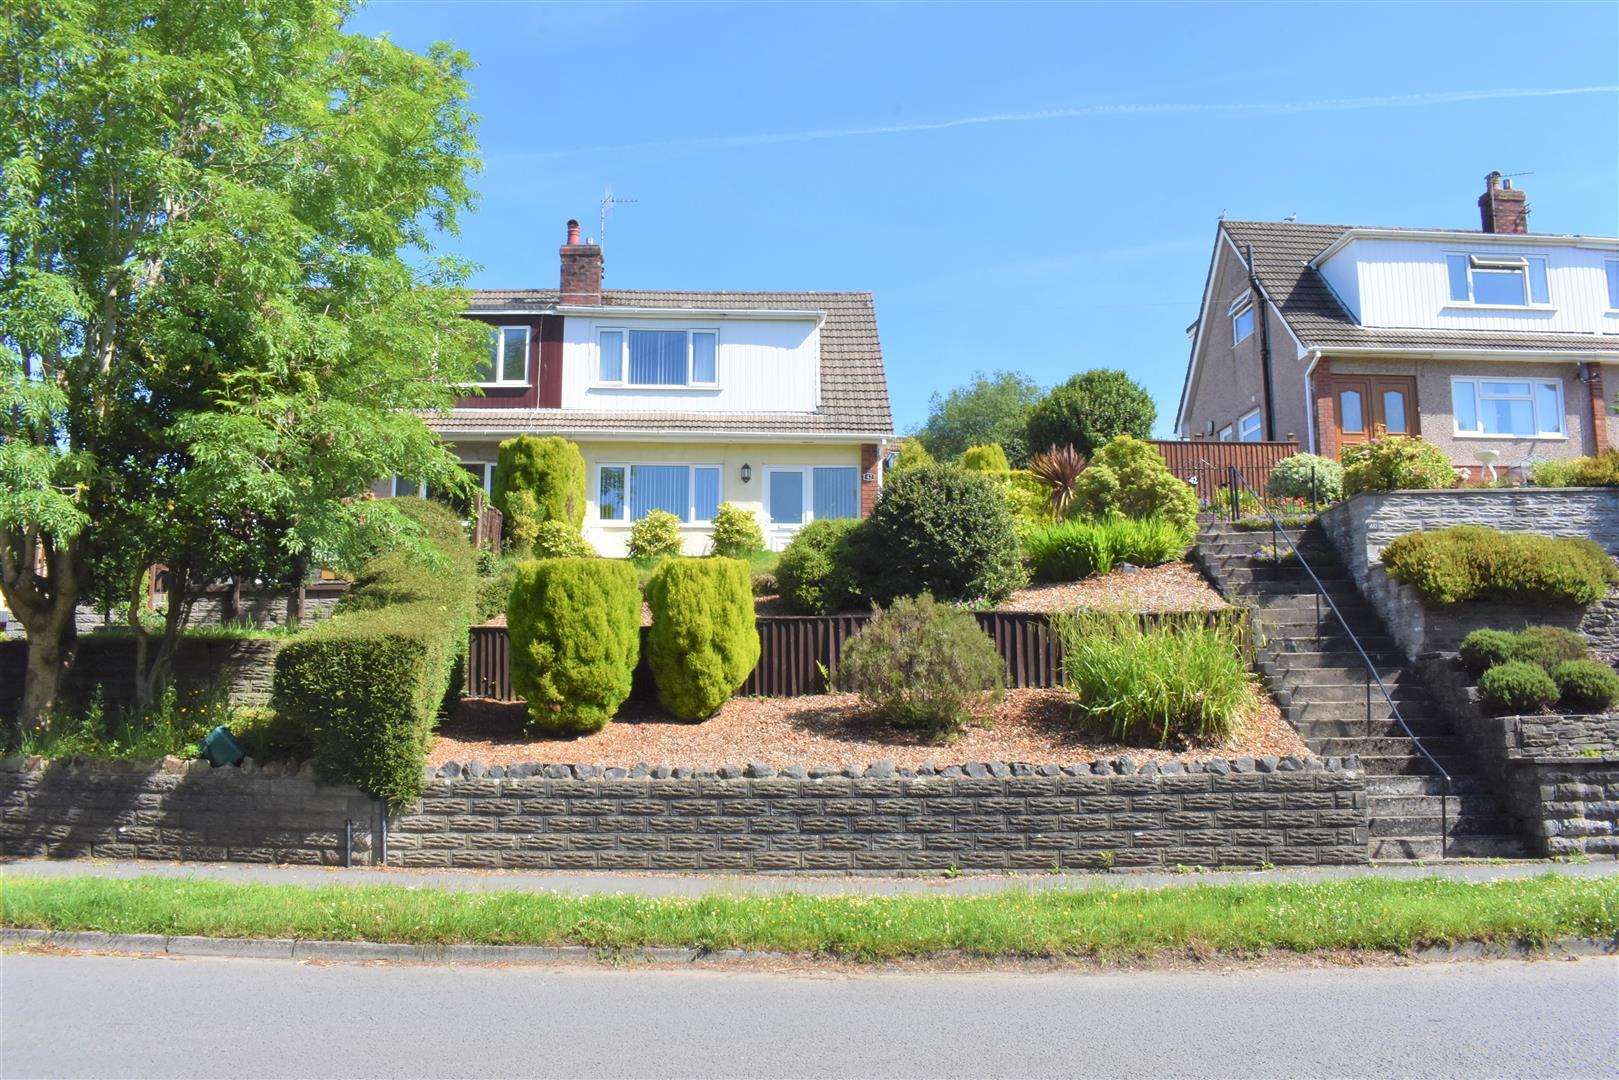 Sketty Park Drive, Sketty, Swansea, SA2 8LN